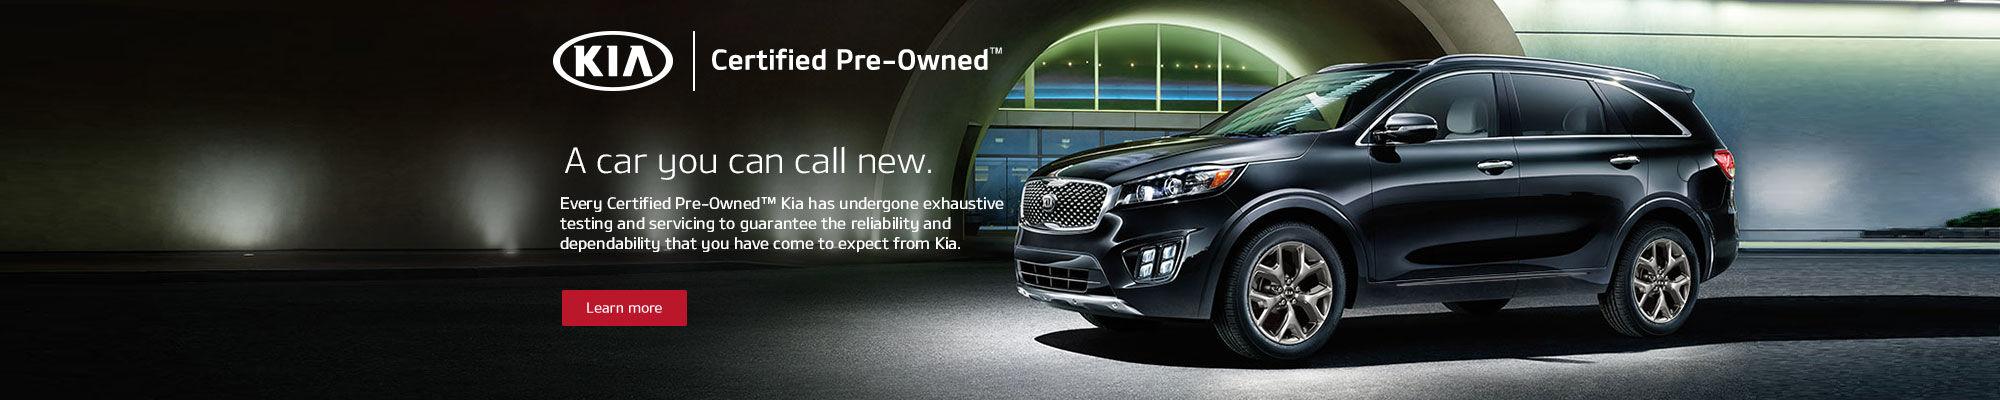 Kia Certified Vehicles